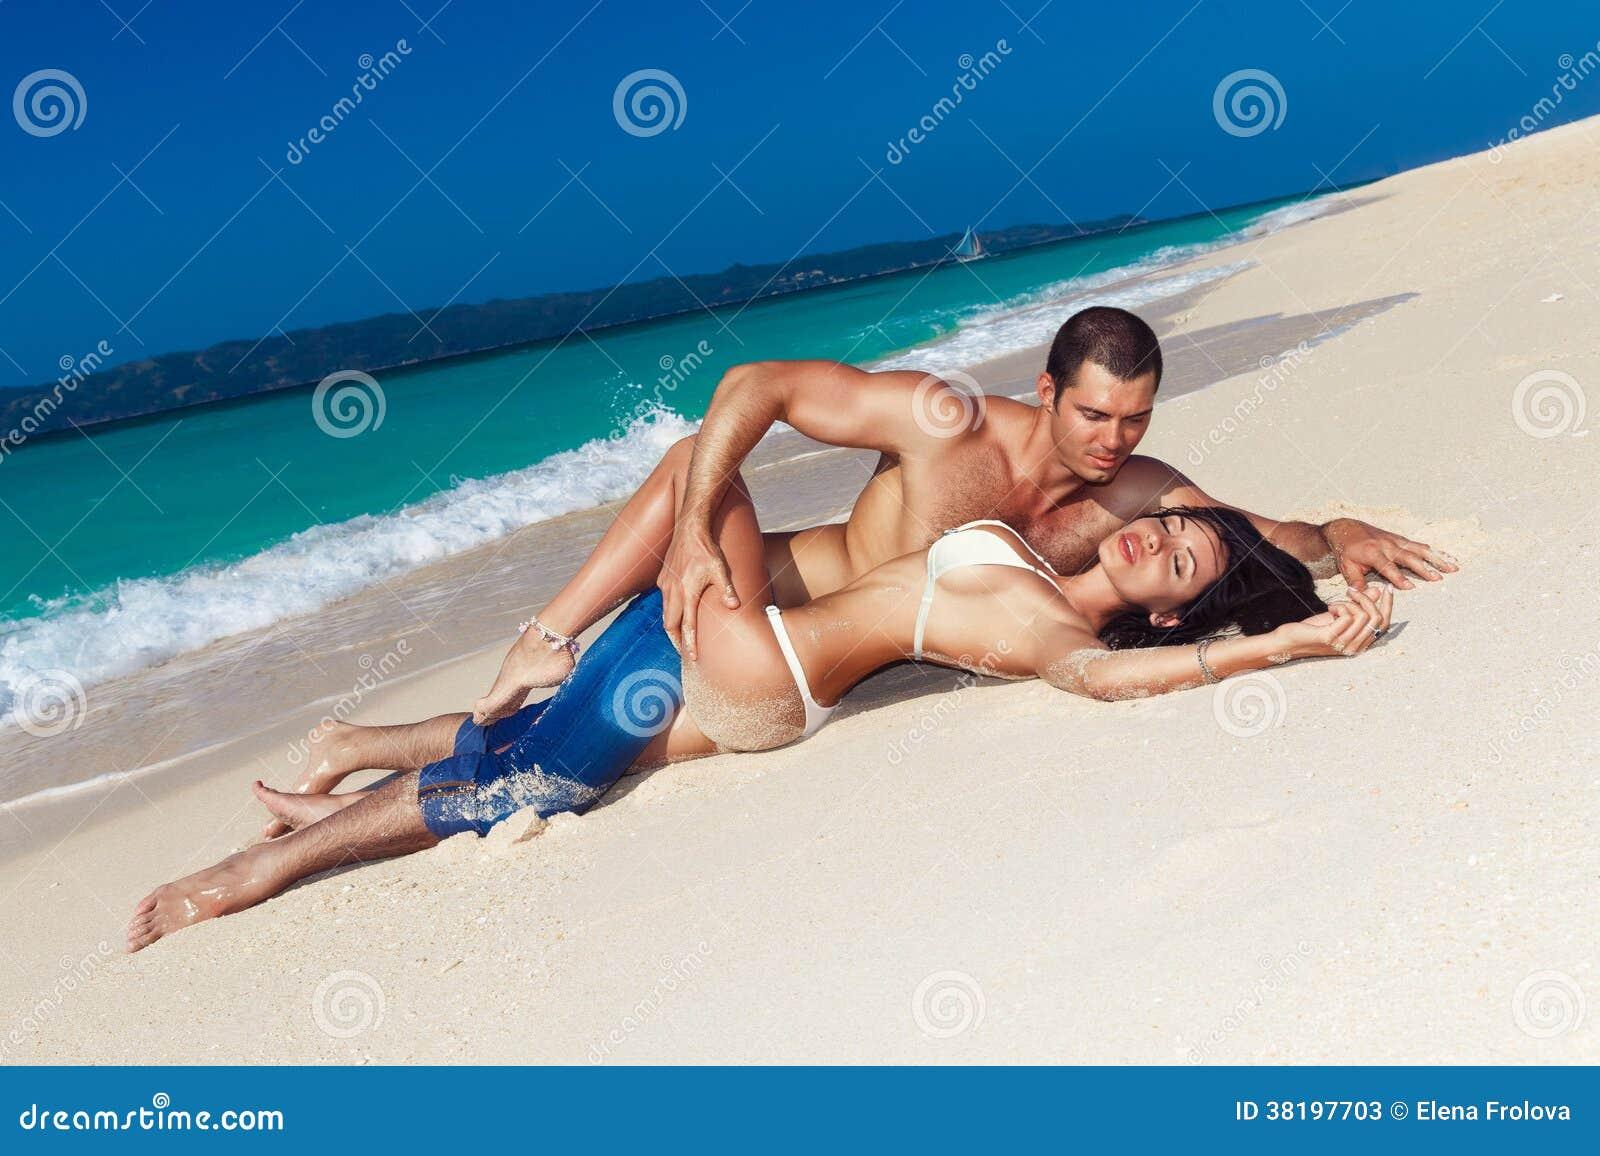 Pärchen Hat Am Strand Sex